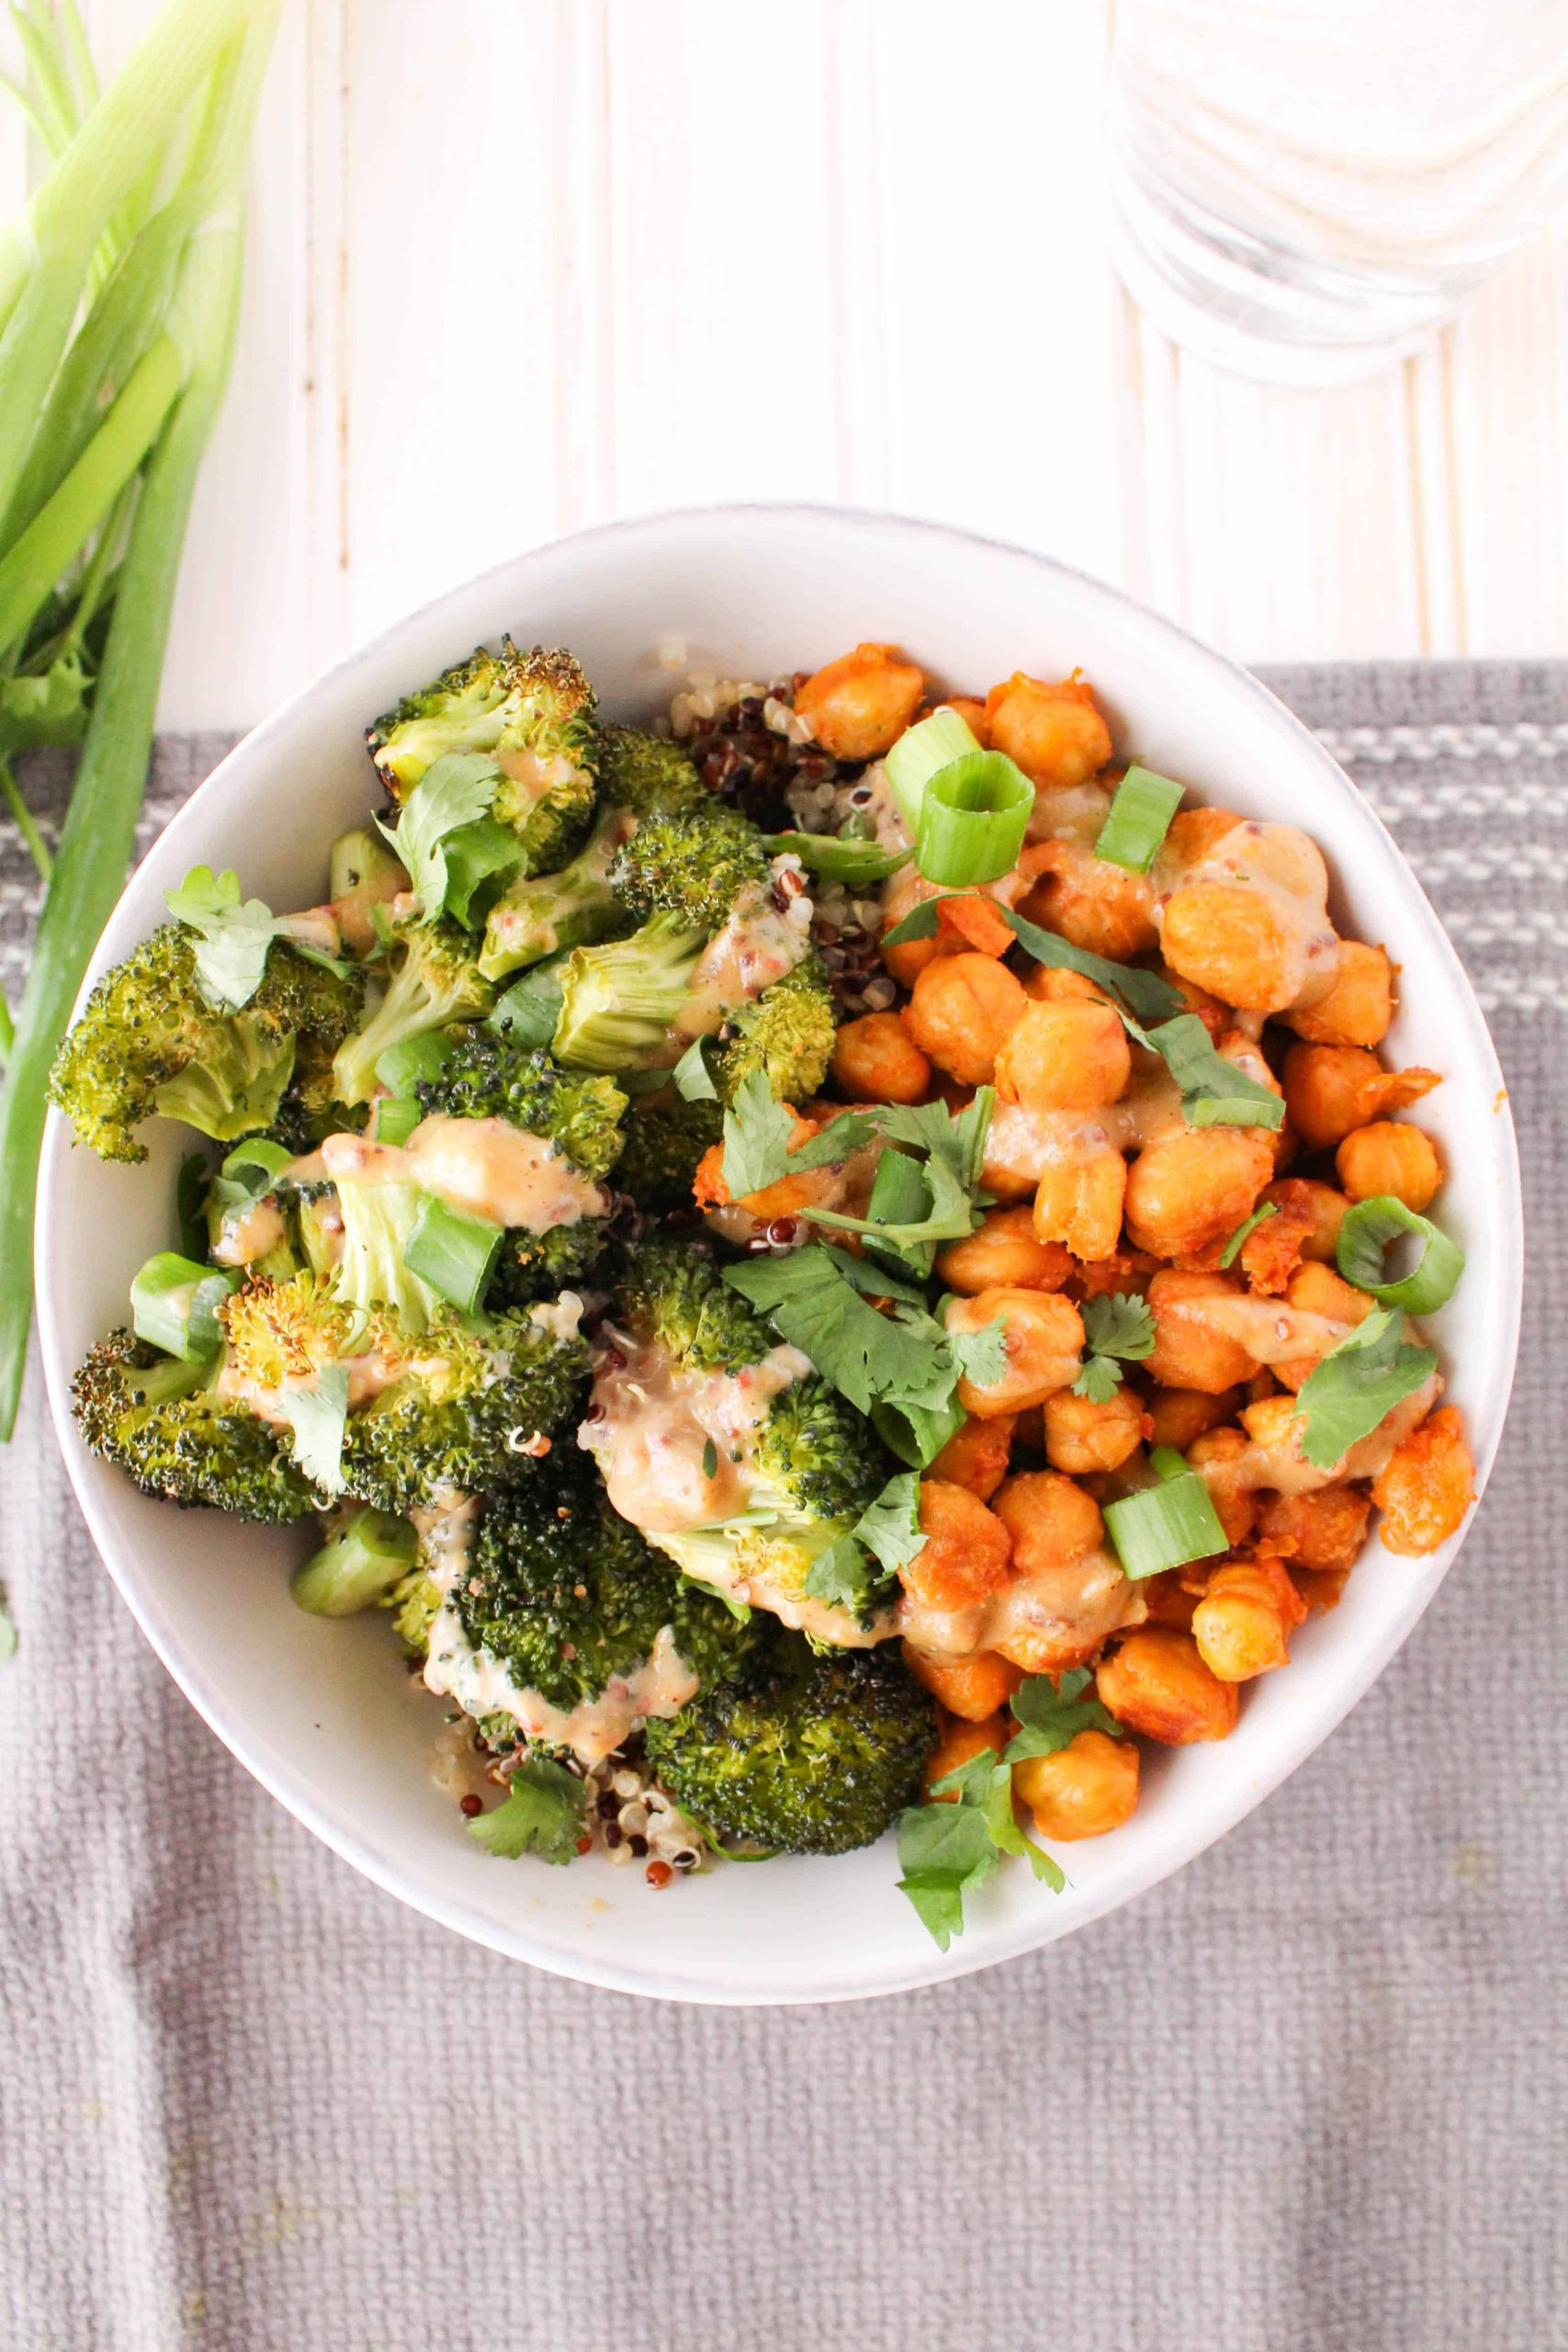 Vegan Plant Based Recipes  Top Plant Based Recipes 2016 The Grateful Grazer